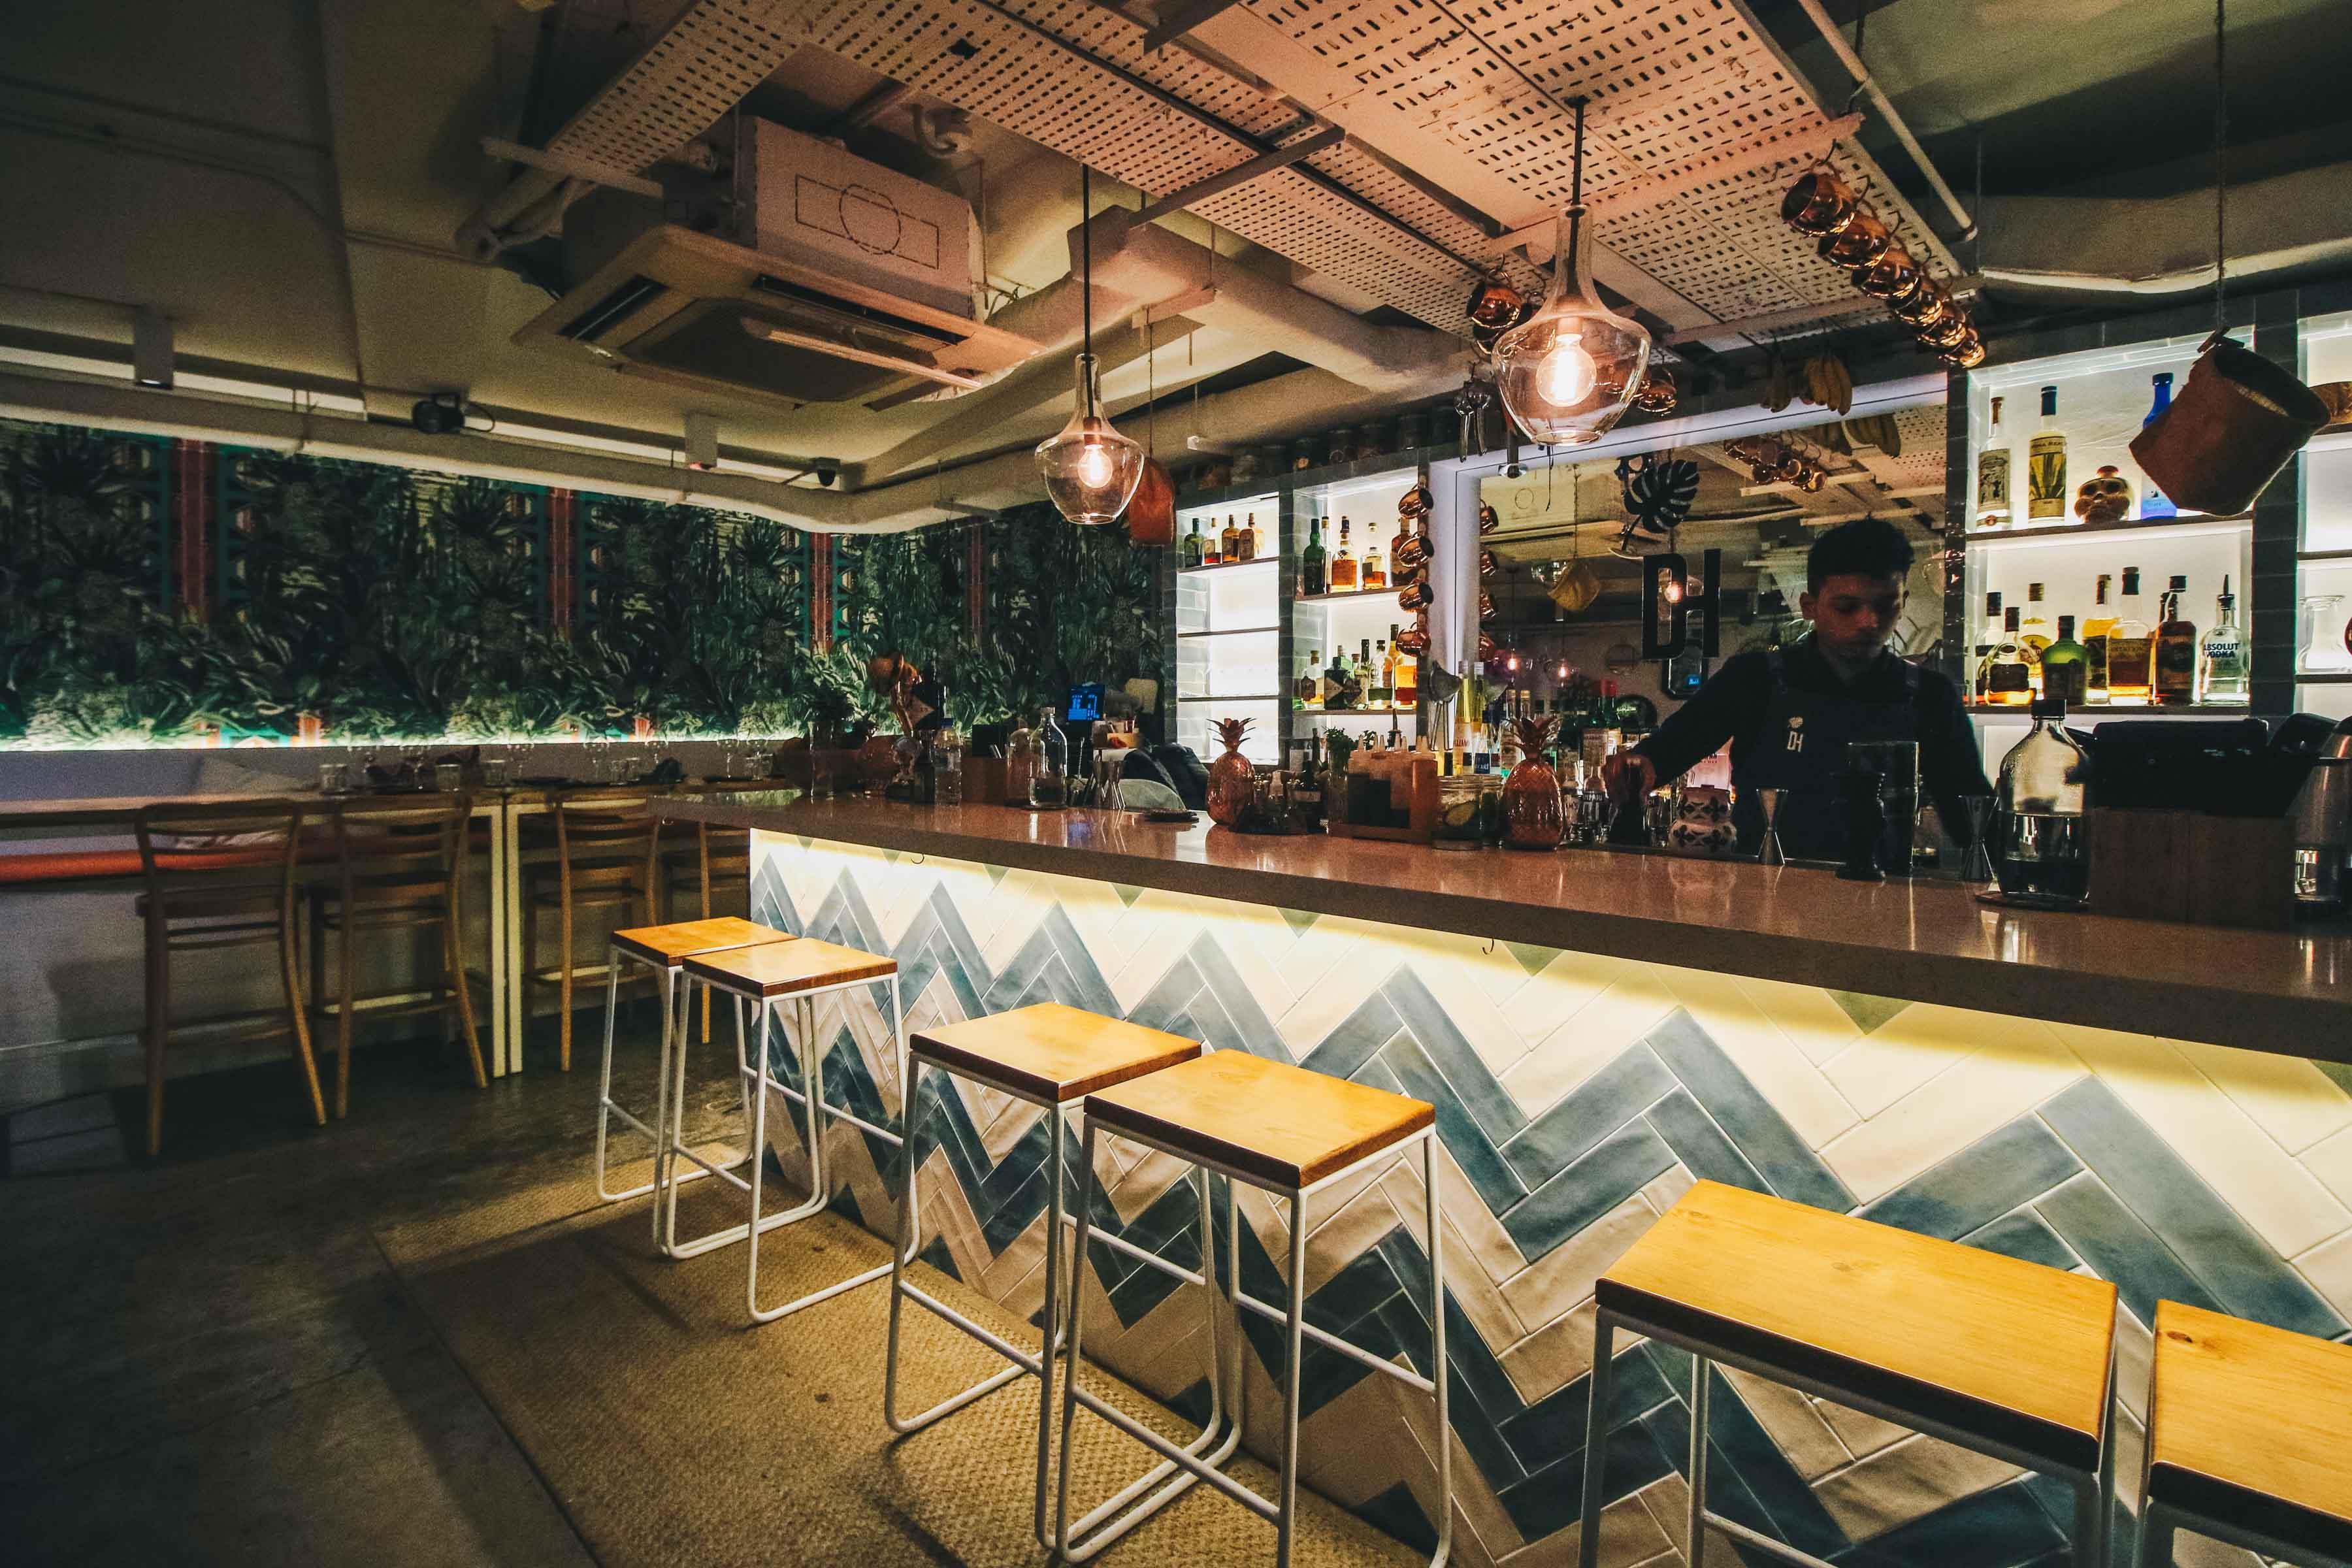 Don-Ho-Social-Kitchen-and-Bar-darrenbloggie